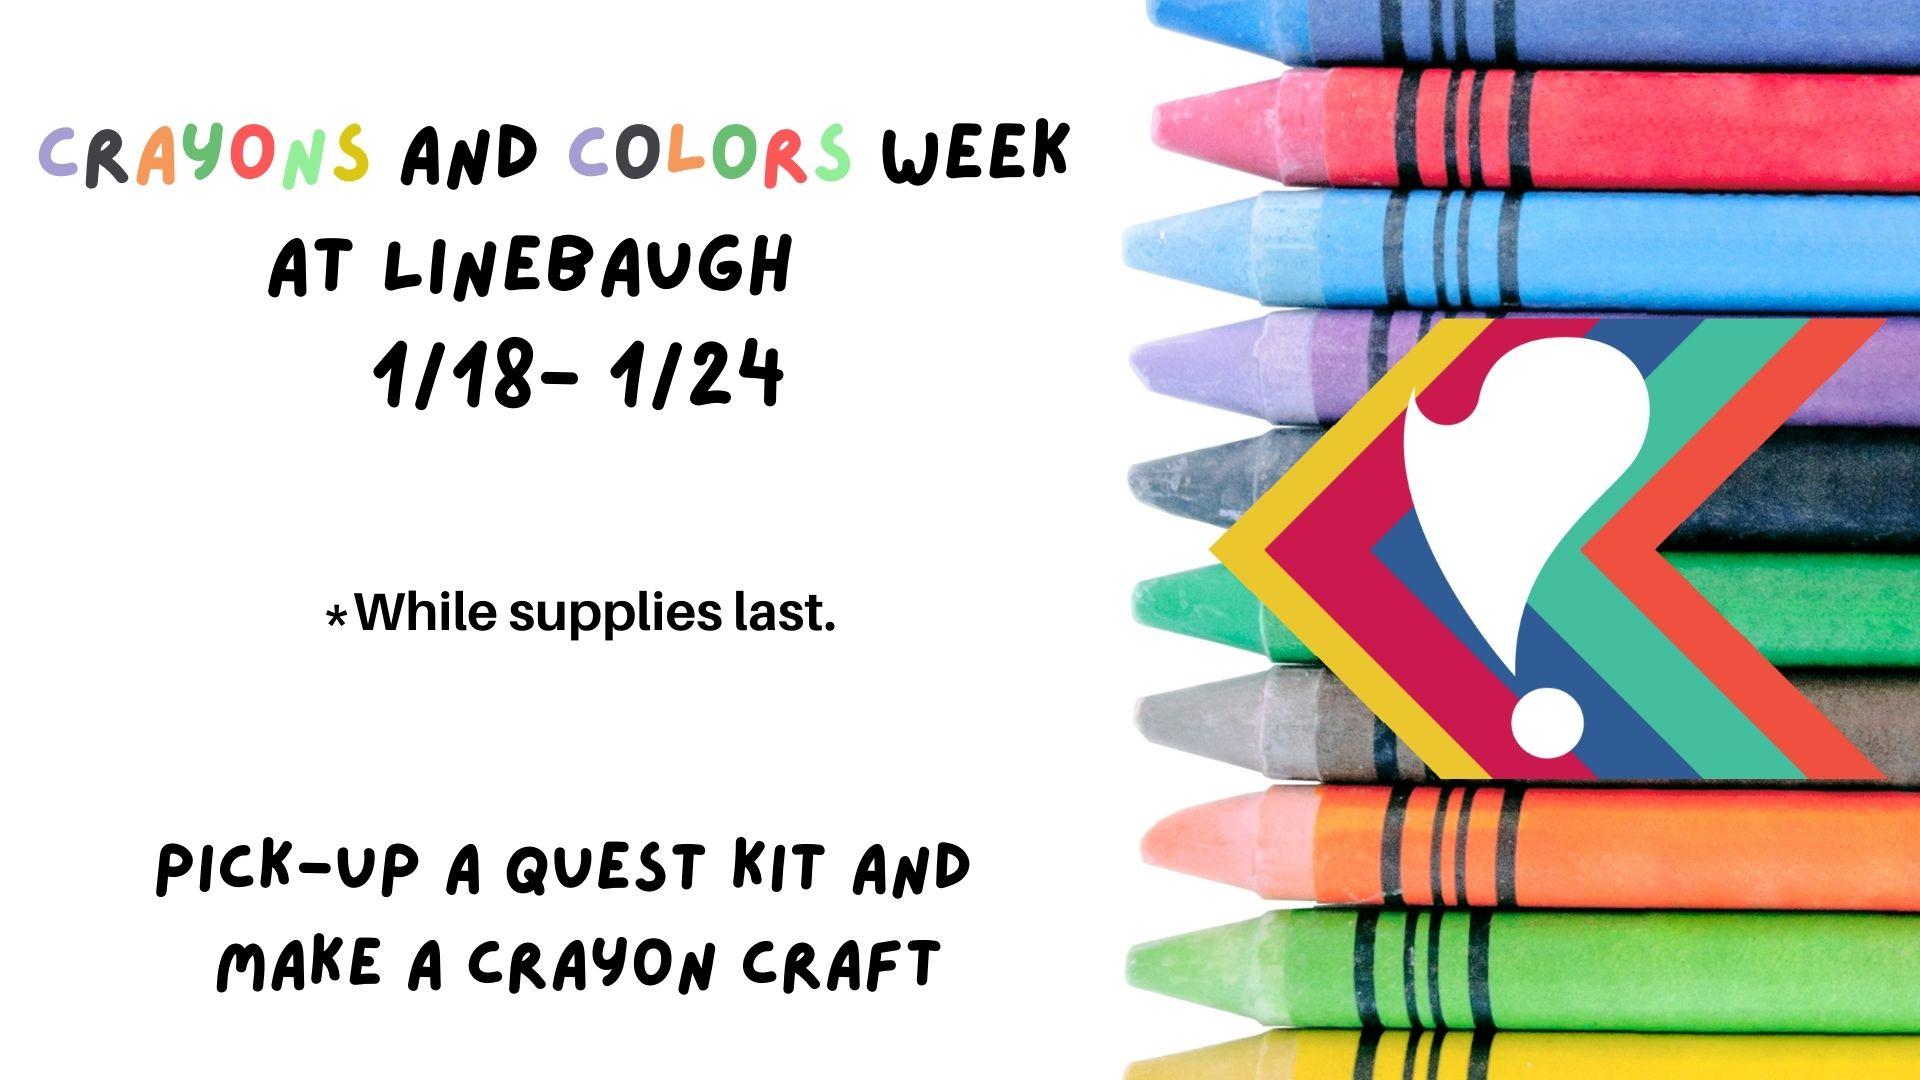 Crayons and Colors Week at Linebaugh